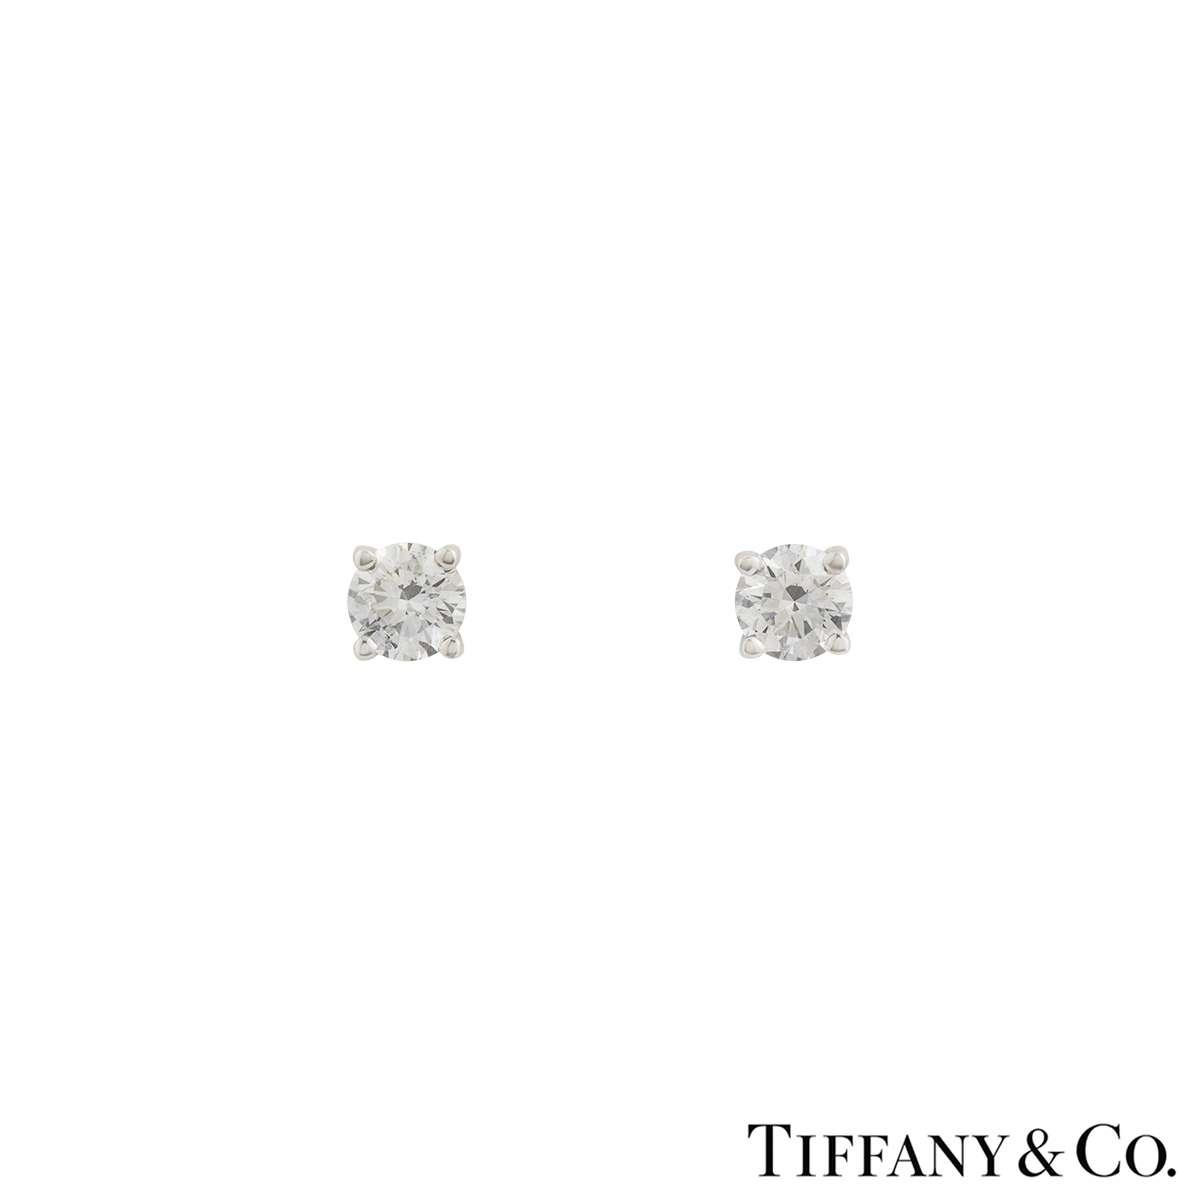 Tiffany Co Solitaire Diamond Platinum Stud Earrings 1 24ct Tdw